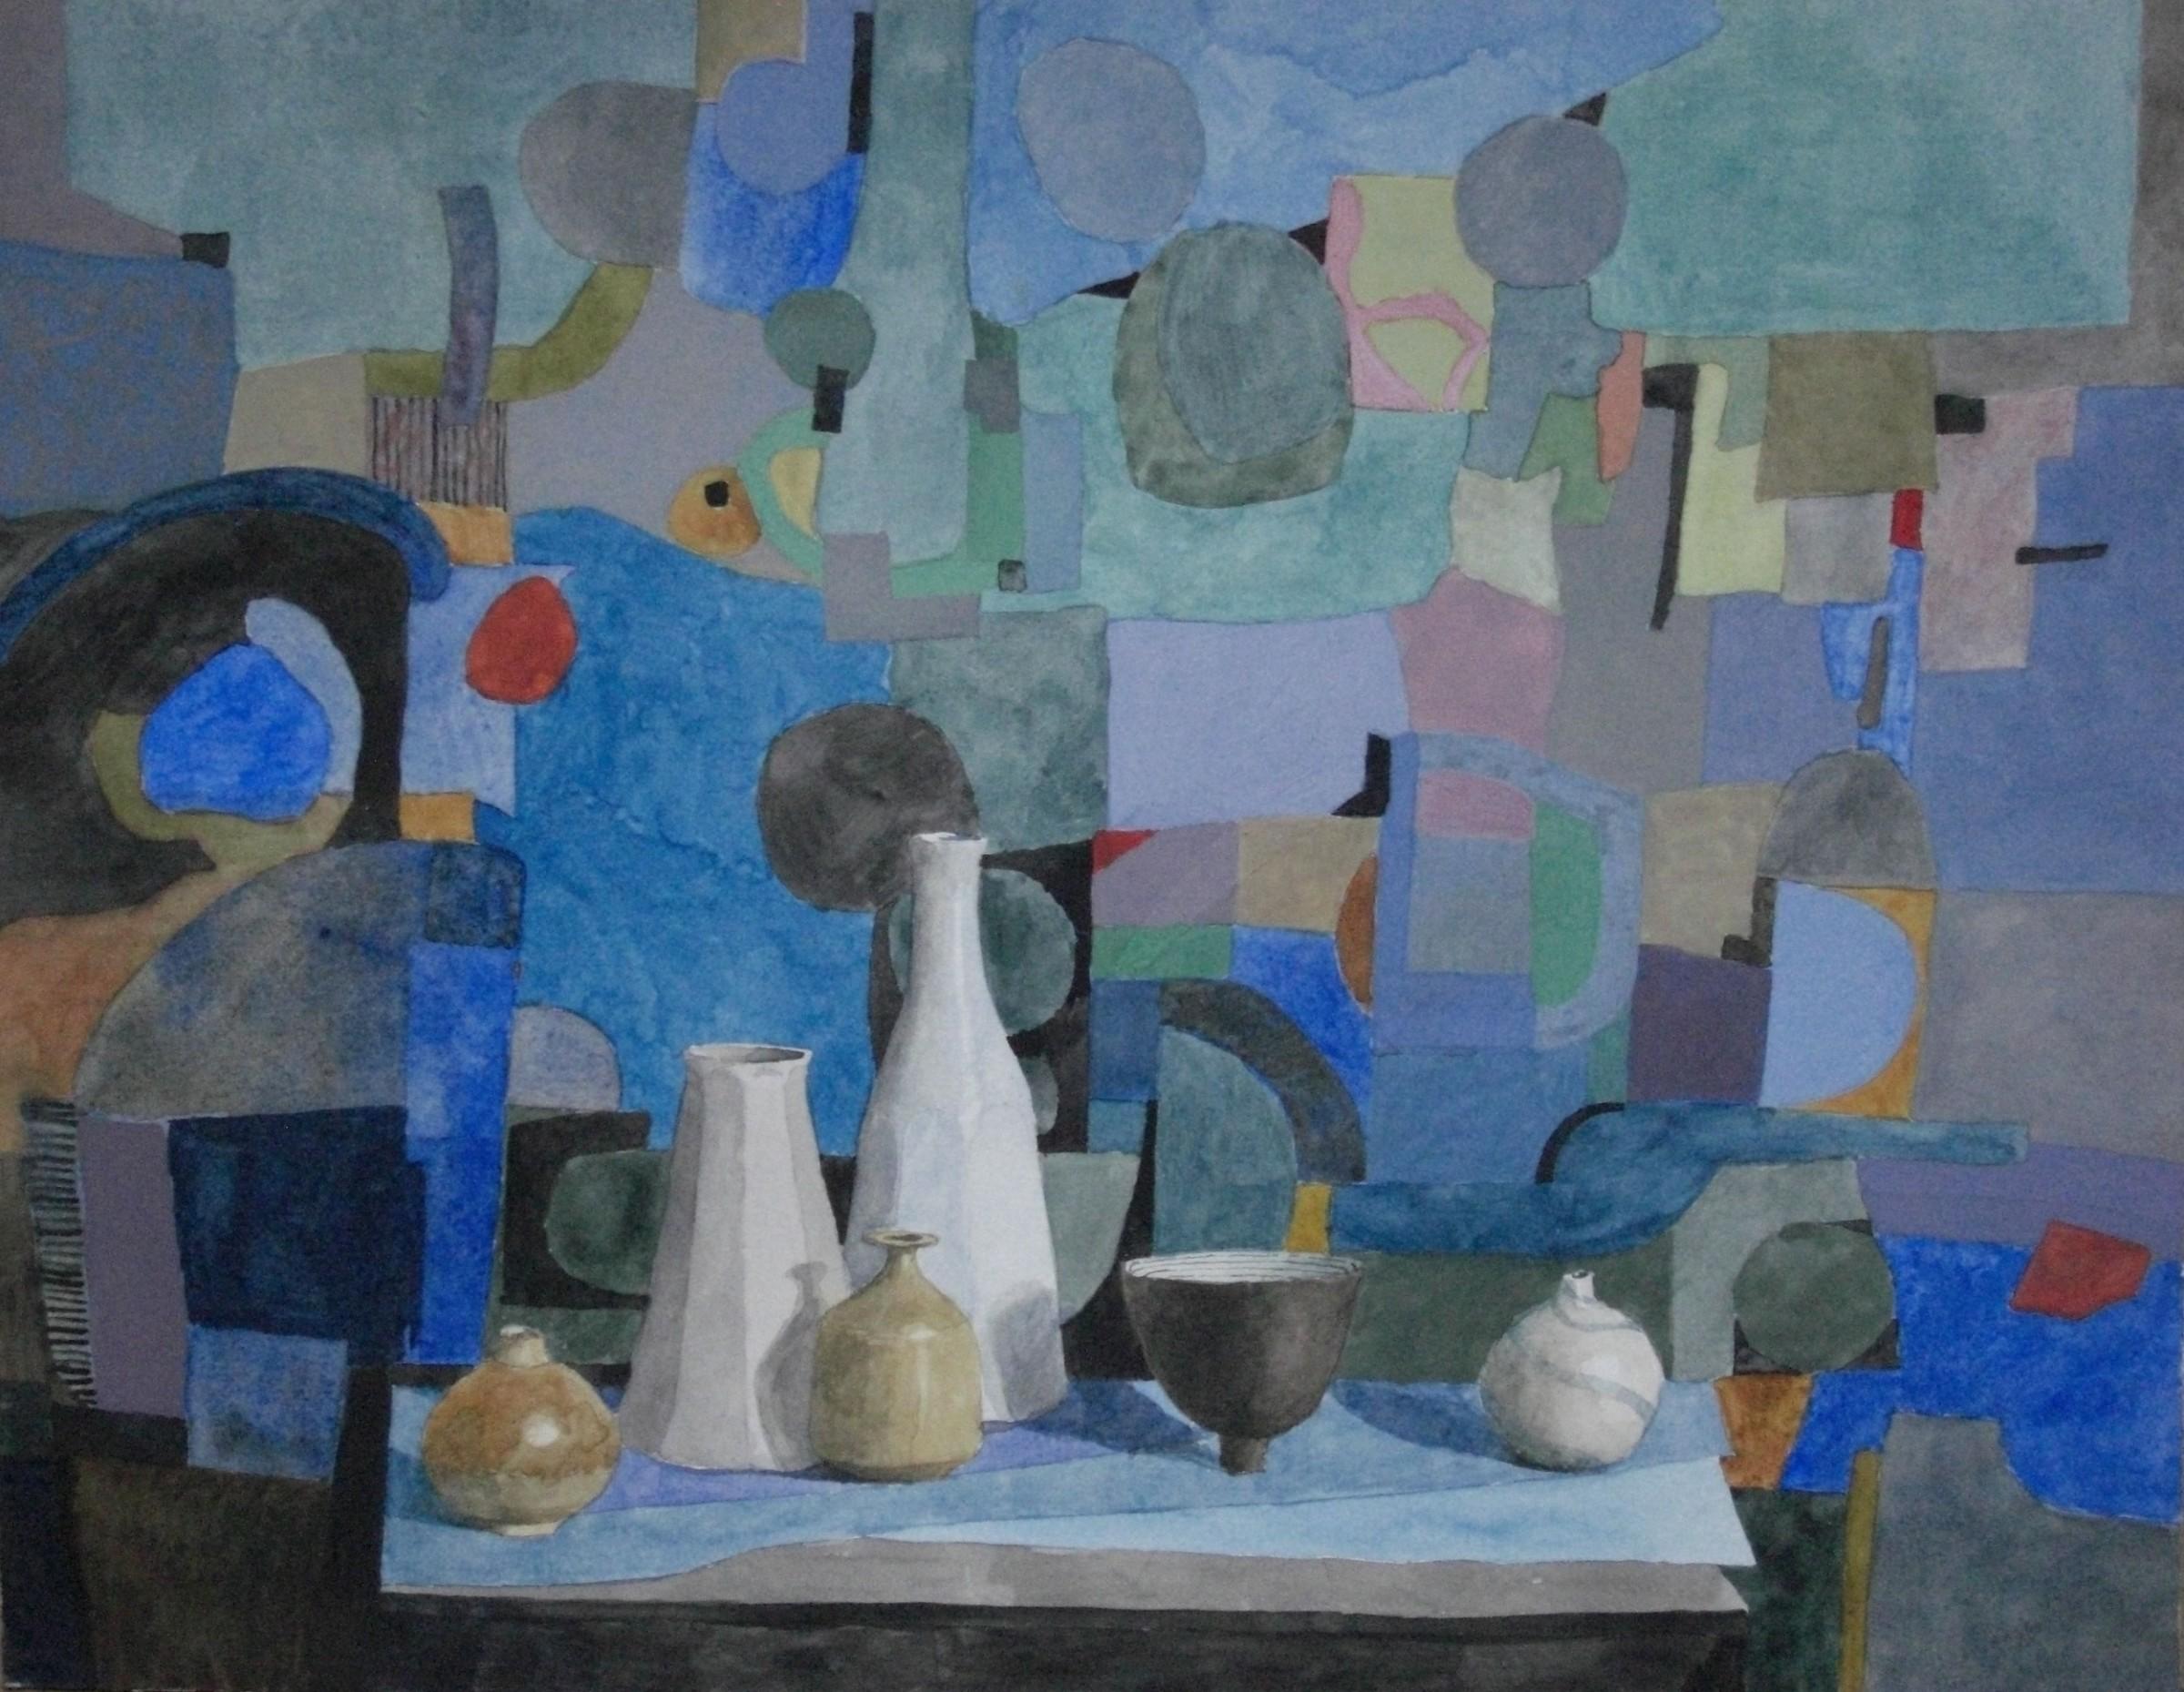 <span class=&#34;link fancybox-details-link&#34;><a href=&#34;/exhibitions/24/works/artworks_standalone10814/&#34;>View Detail Page</a></span><div class=&#34;artist&#34;><span class=&#34;artist&#34;><strong>Annie Williams</strong></span></div><div class=&#34;title&#34;><em>Fields of Blue II</em></div><div class=&#34;medium&#34;>watercolour & gouache</div><div class=&#34;dimensions&#34;>58x67cm</div>